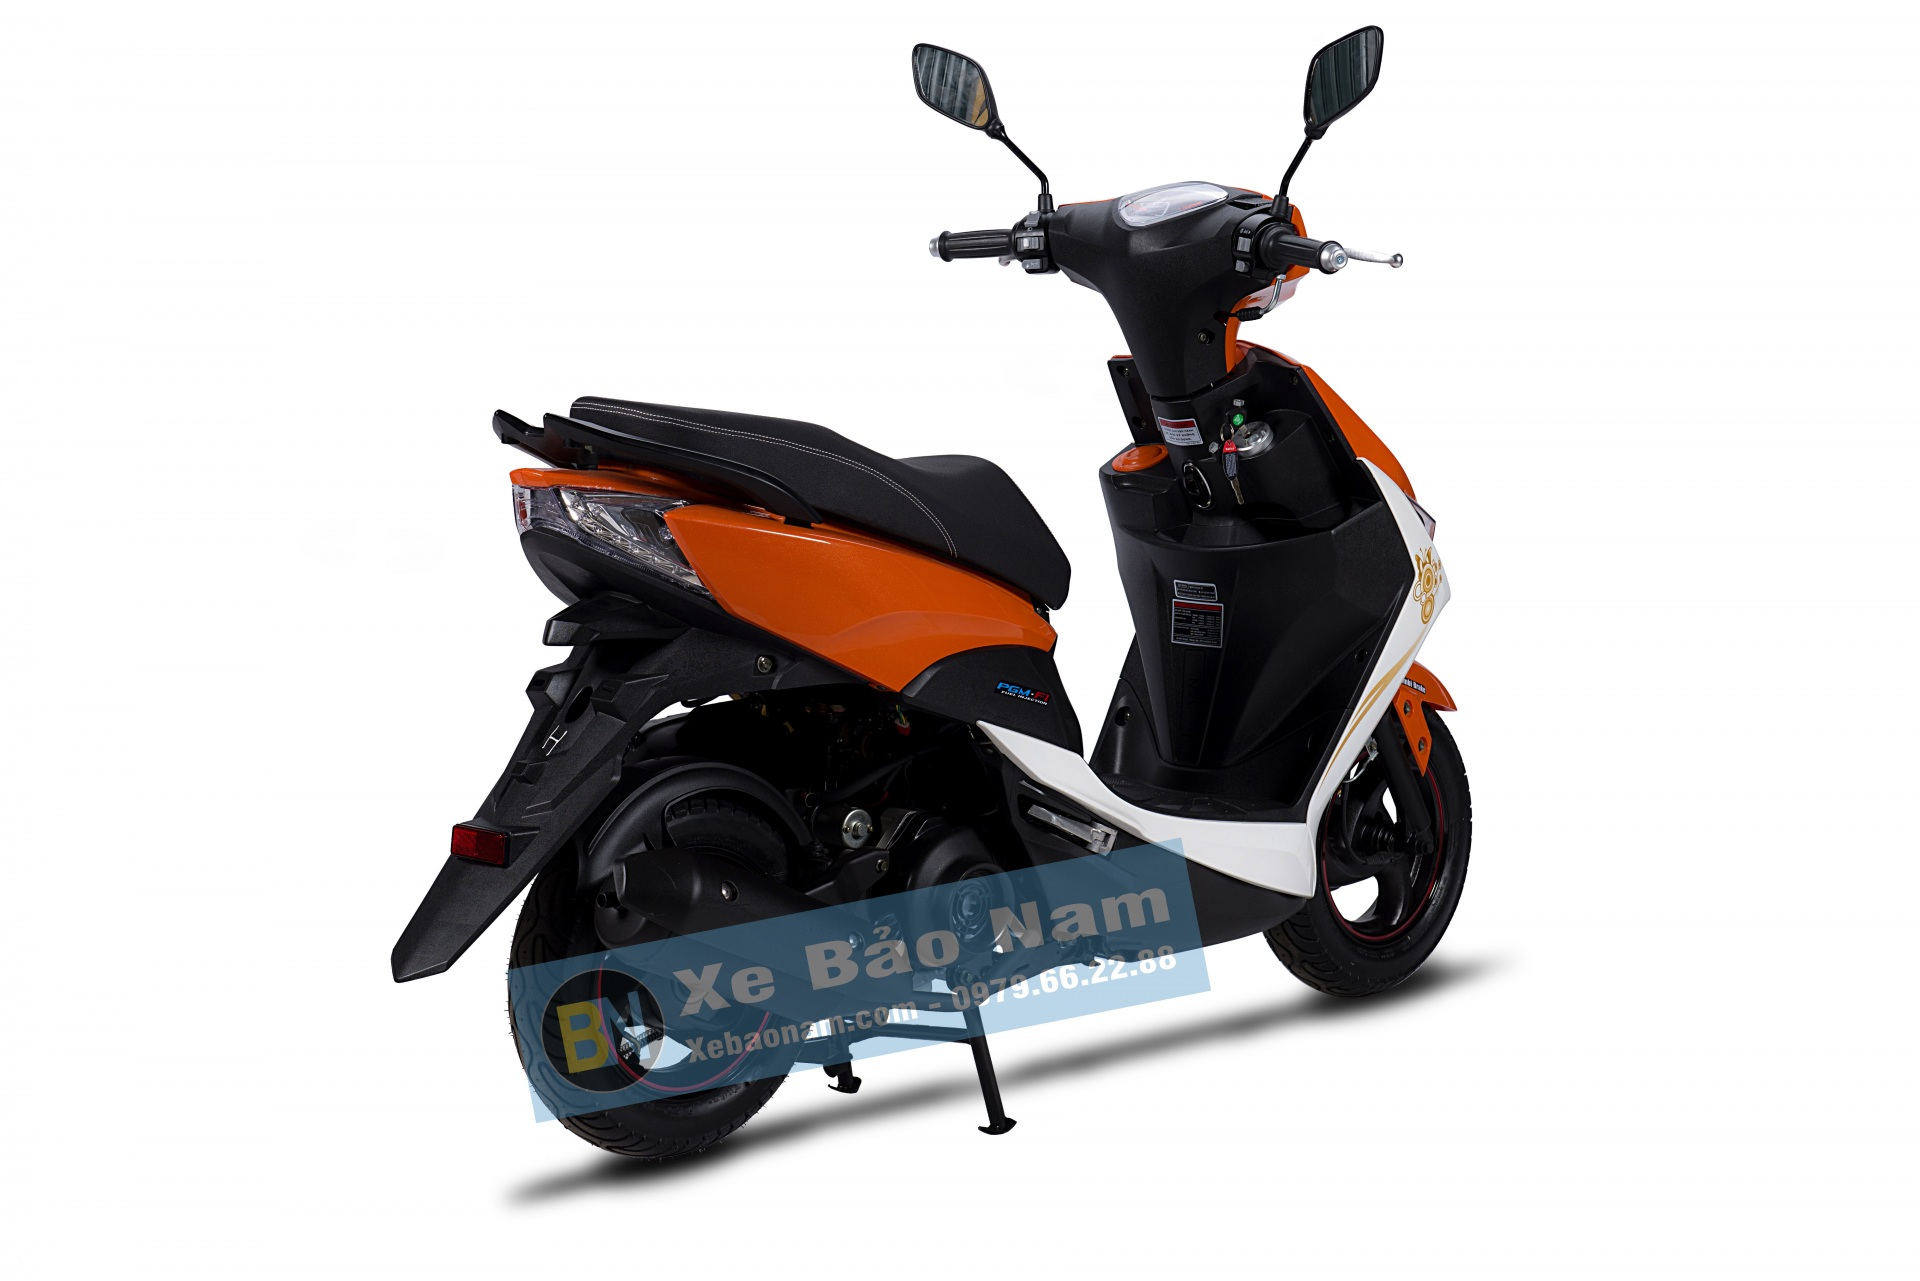 xe-ga-50cc-s8-new-city-mau-cam-trang-3